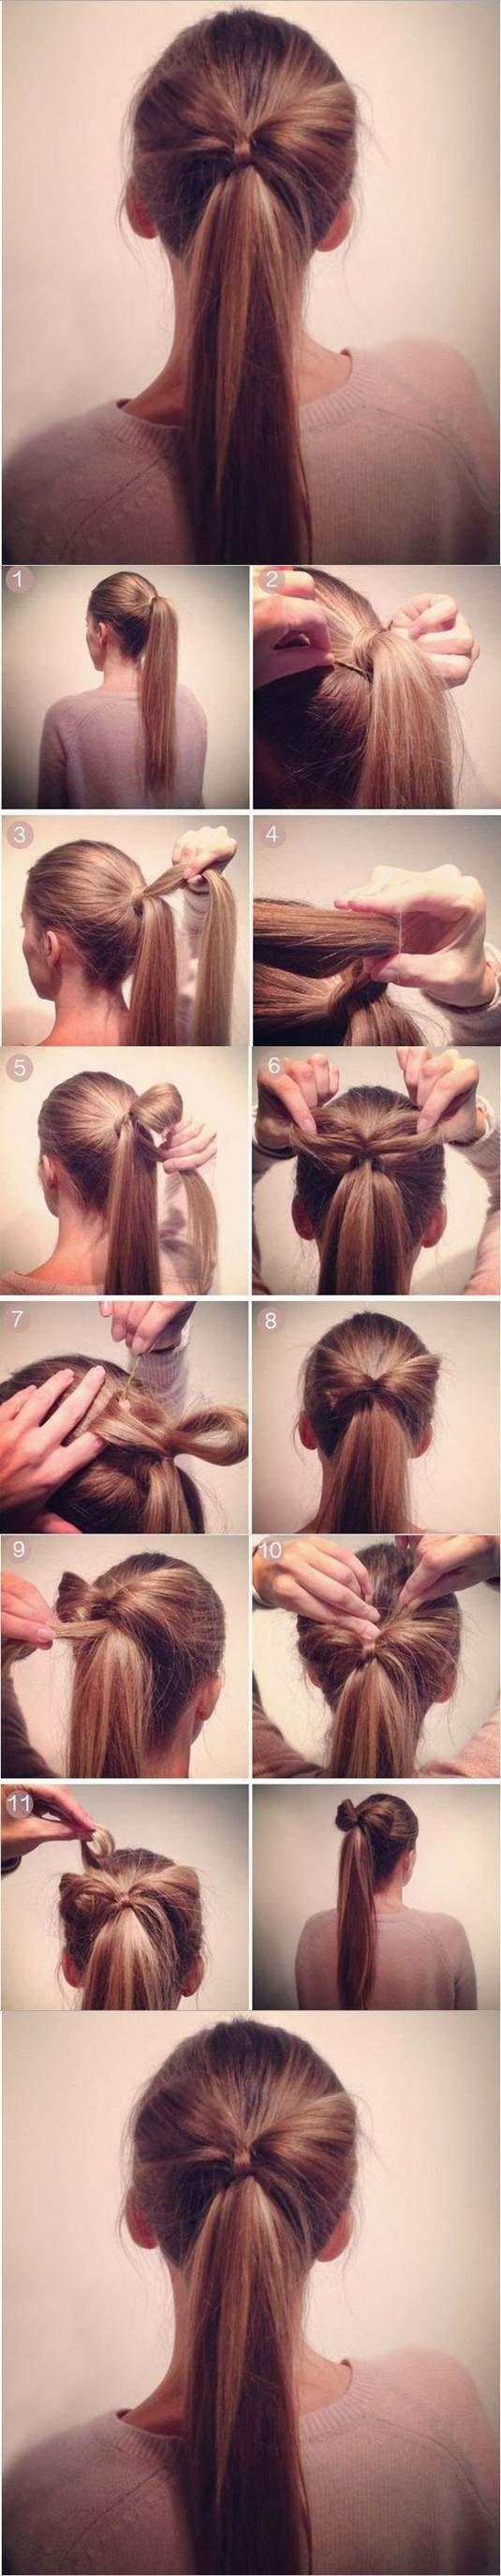 DIY Bow Ponytail Hairstyle | iCreativeIdeas.com Like Us on Facebook ==> https://www.facebook.com/icreativeideas